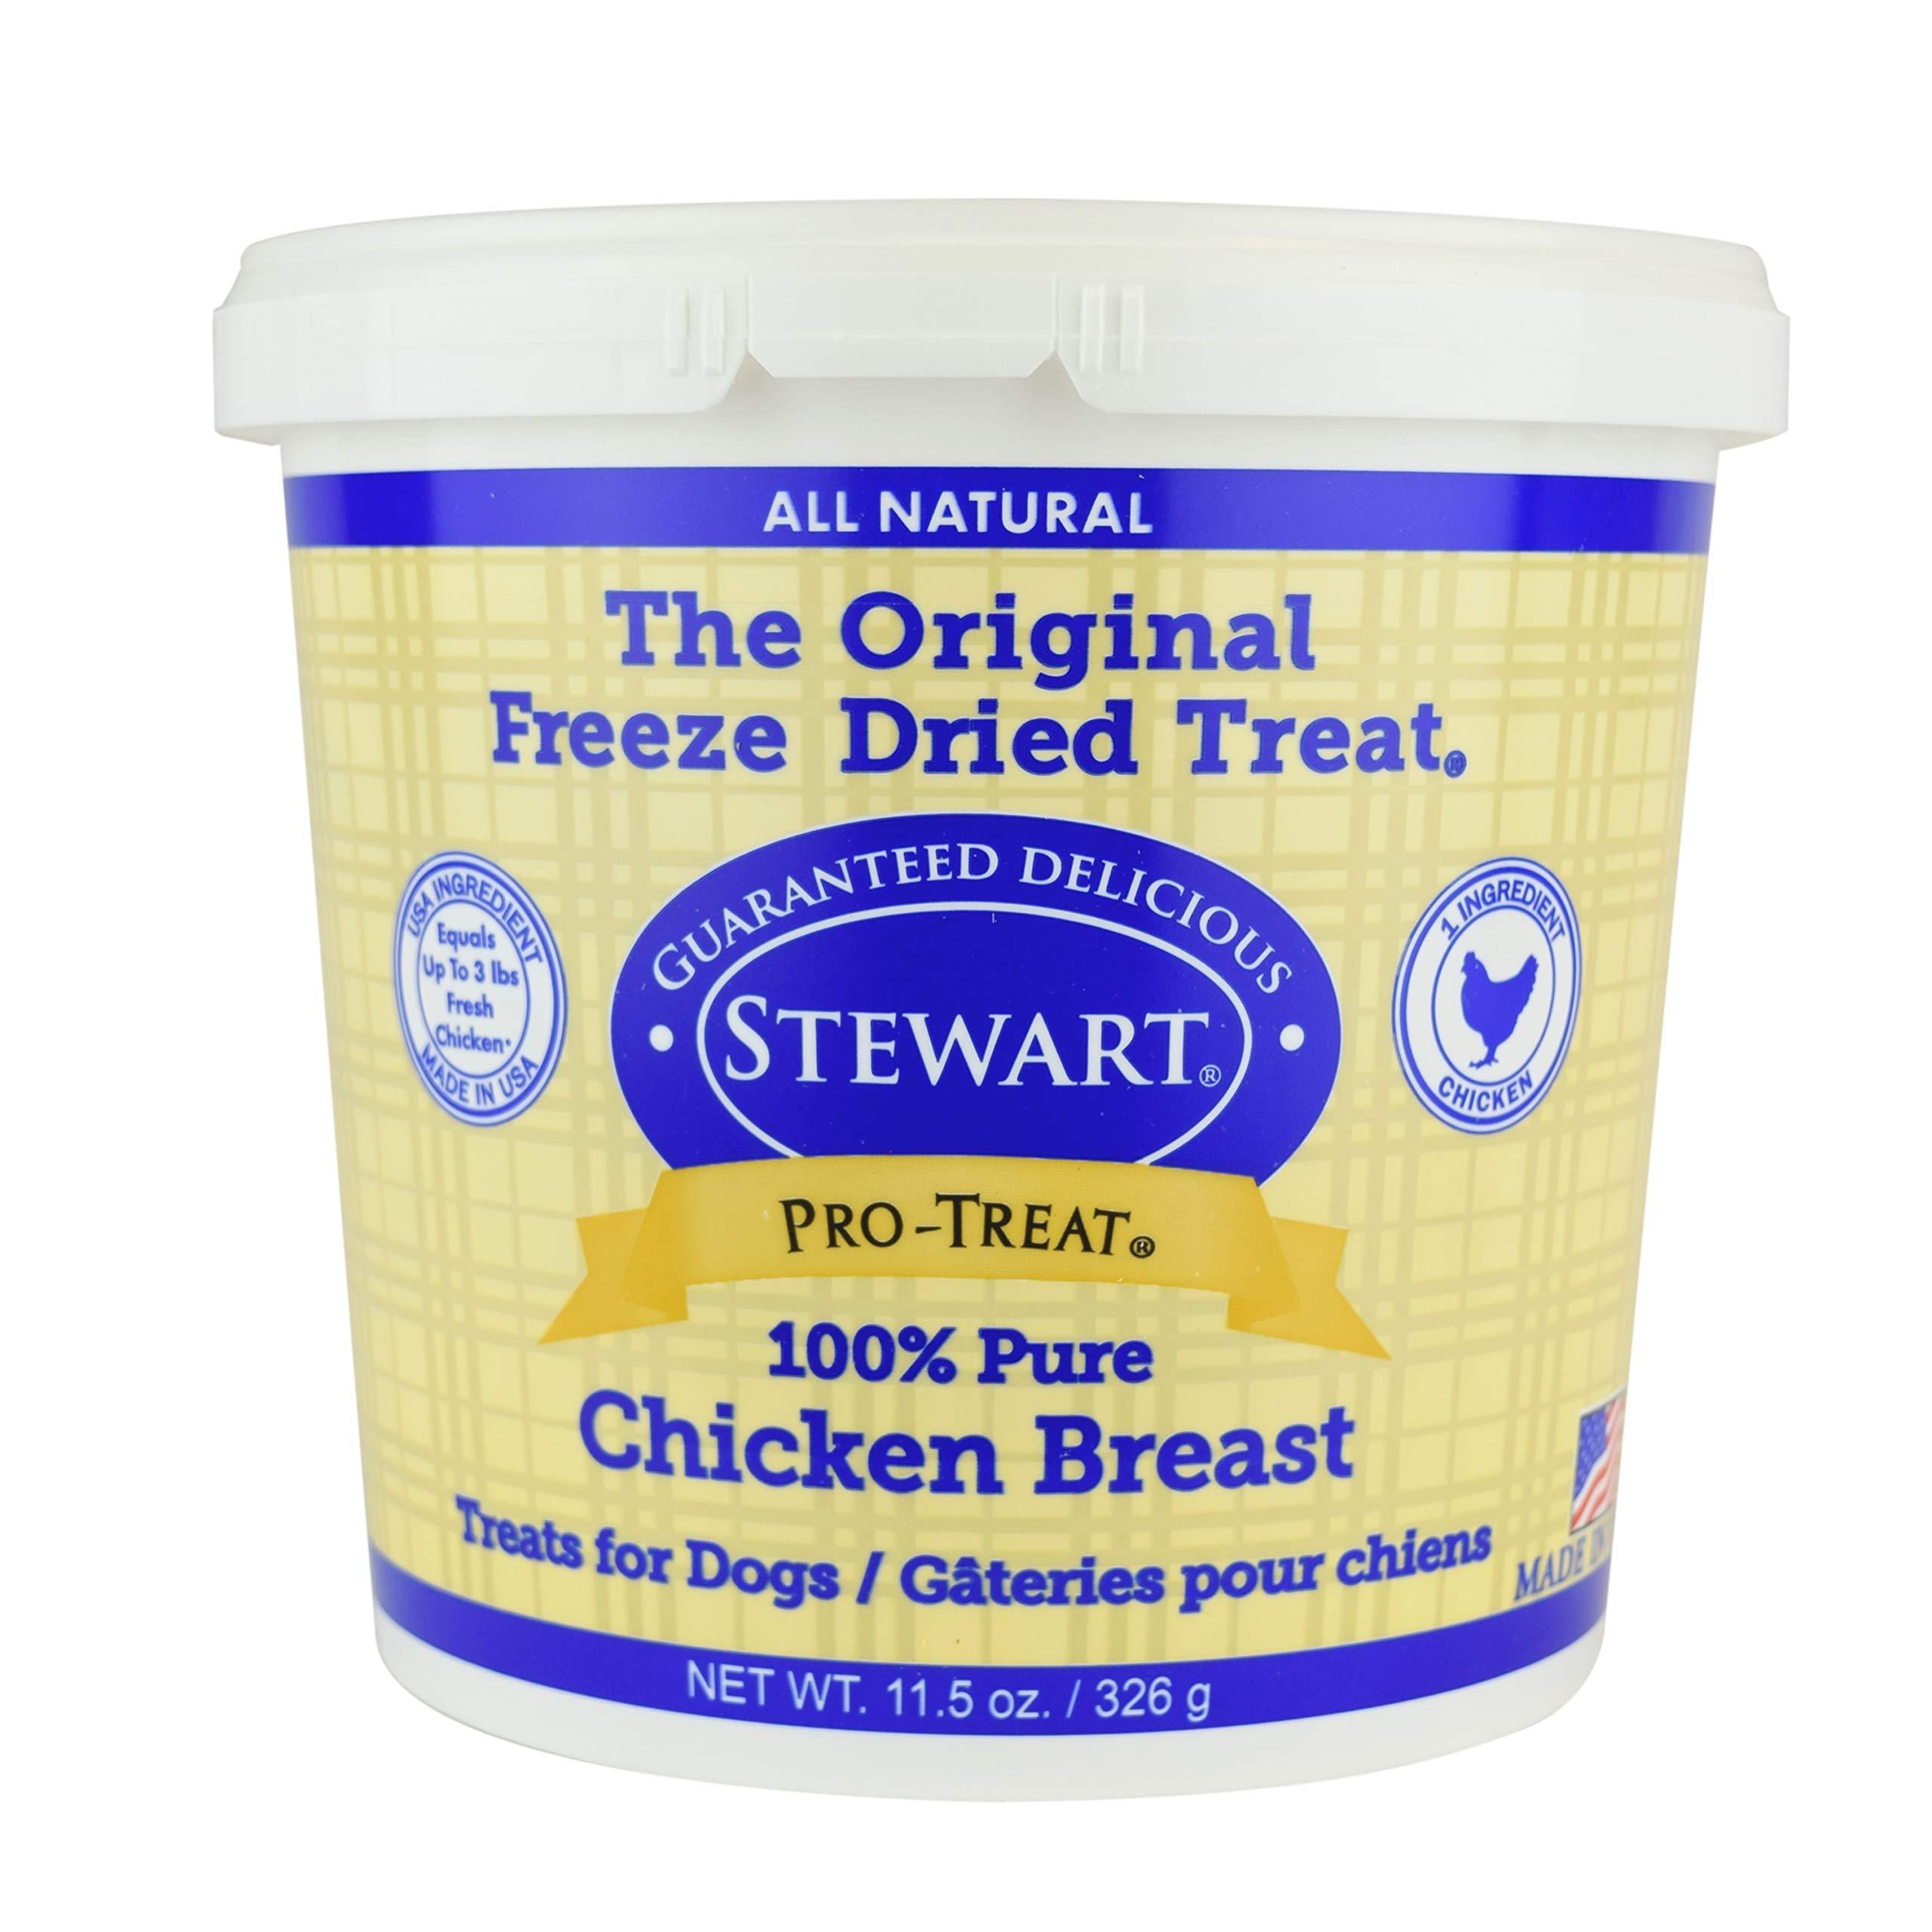 Stewart Pro-Treat, Freeze Dried Chicken Breast Dog Treats, Single Ingredient, Grain Free, USA Made, 11.5 oz. Resealable Tub